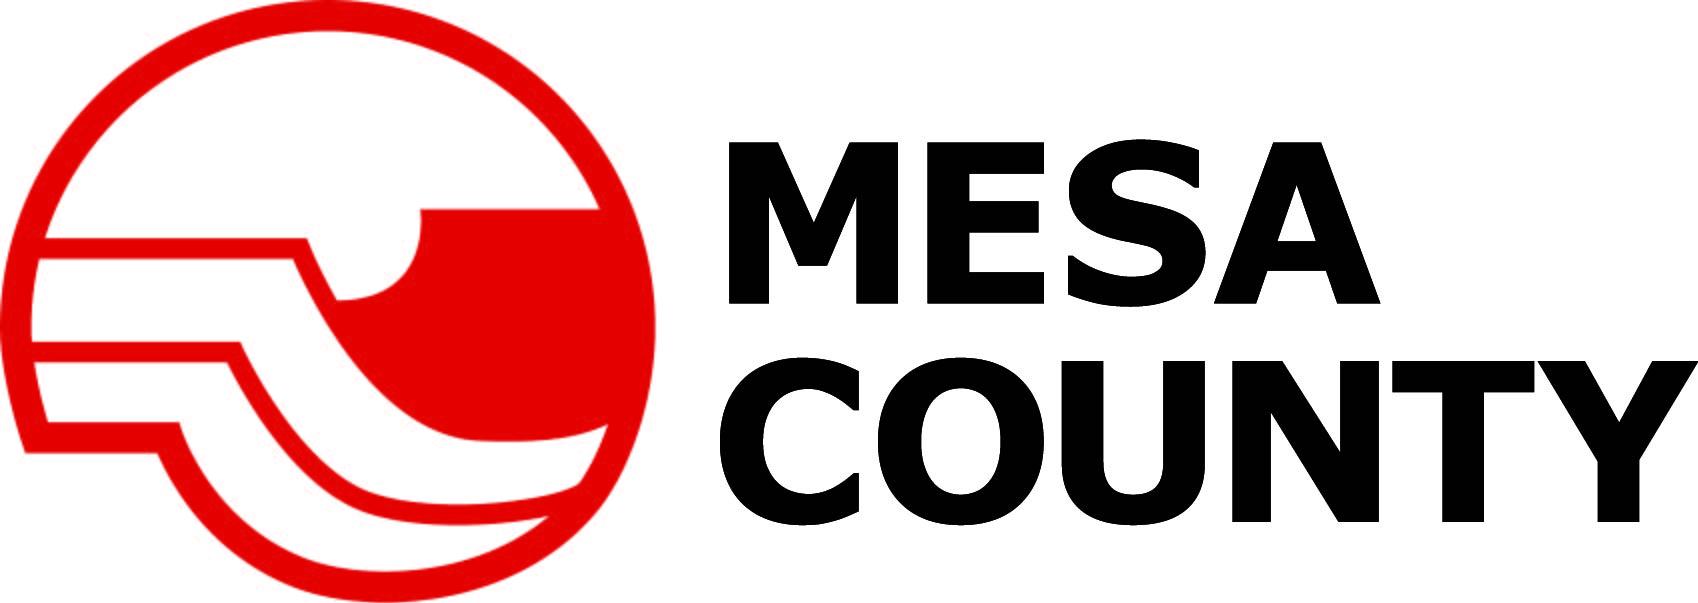 Mesa County logo 2_1470106210932.jpg